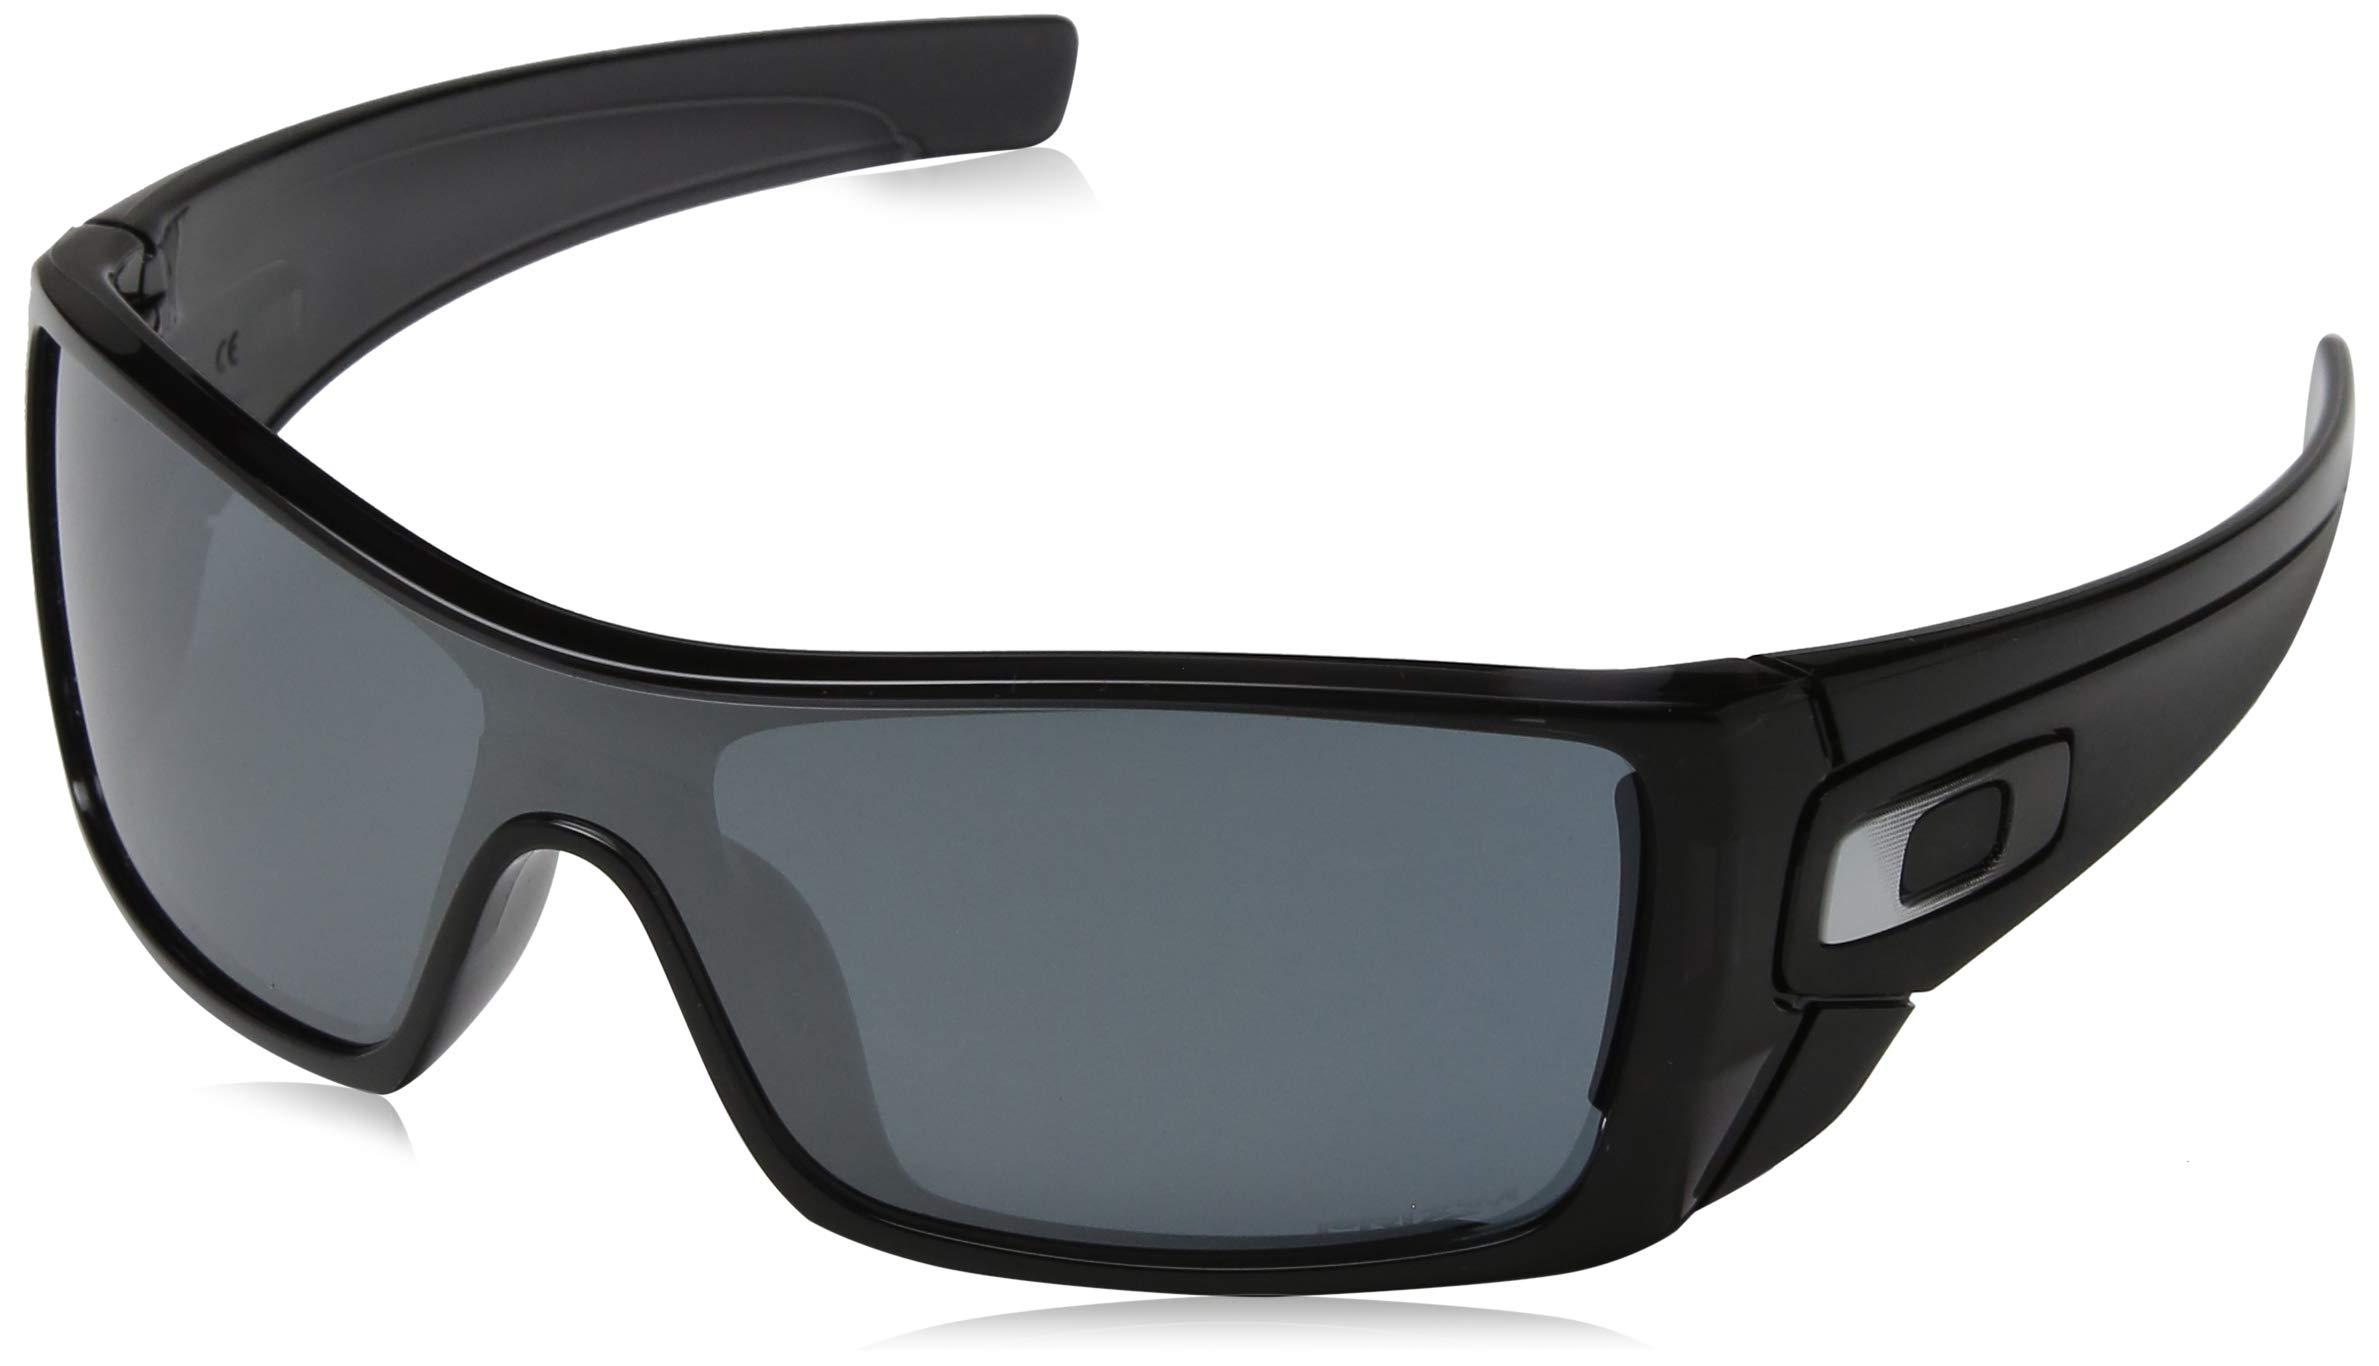 ab9a0e21045 Oakley Batwolf Men s Lifestyle Designer Sunglasses Eyewear product image